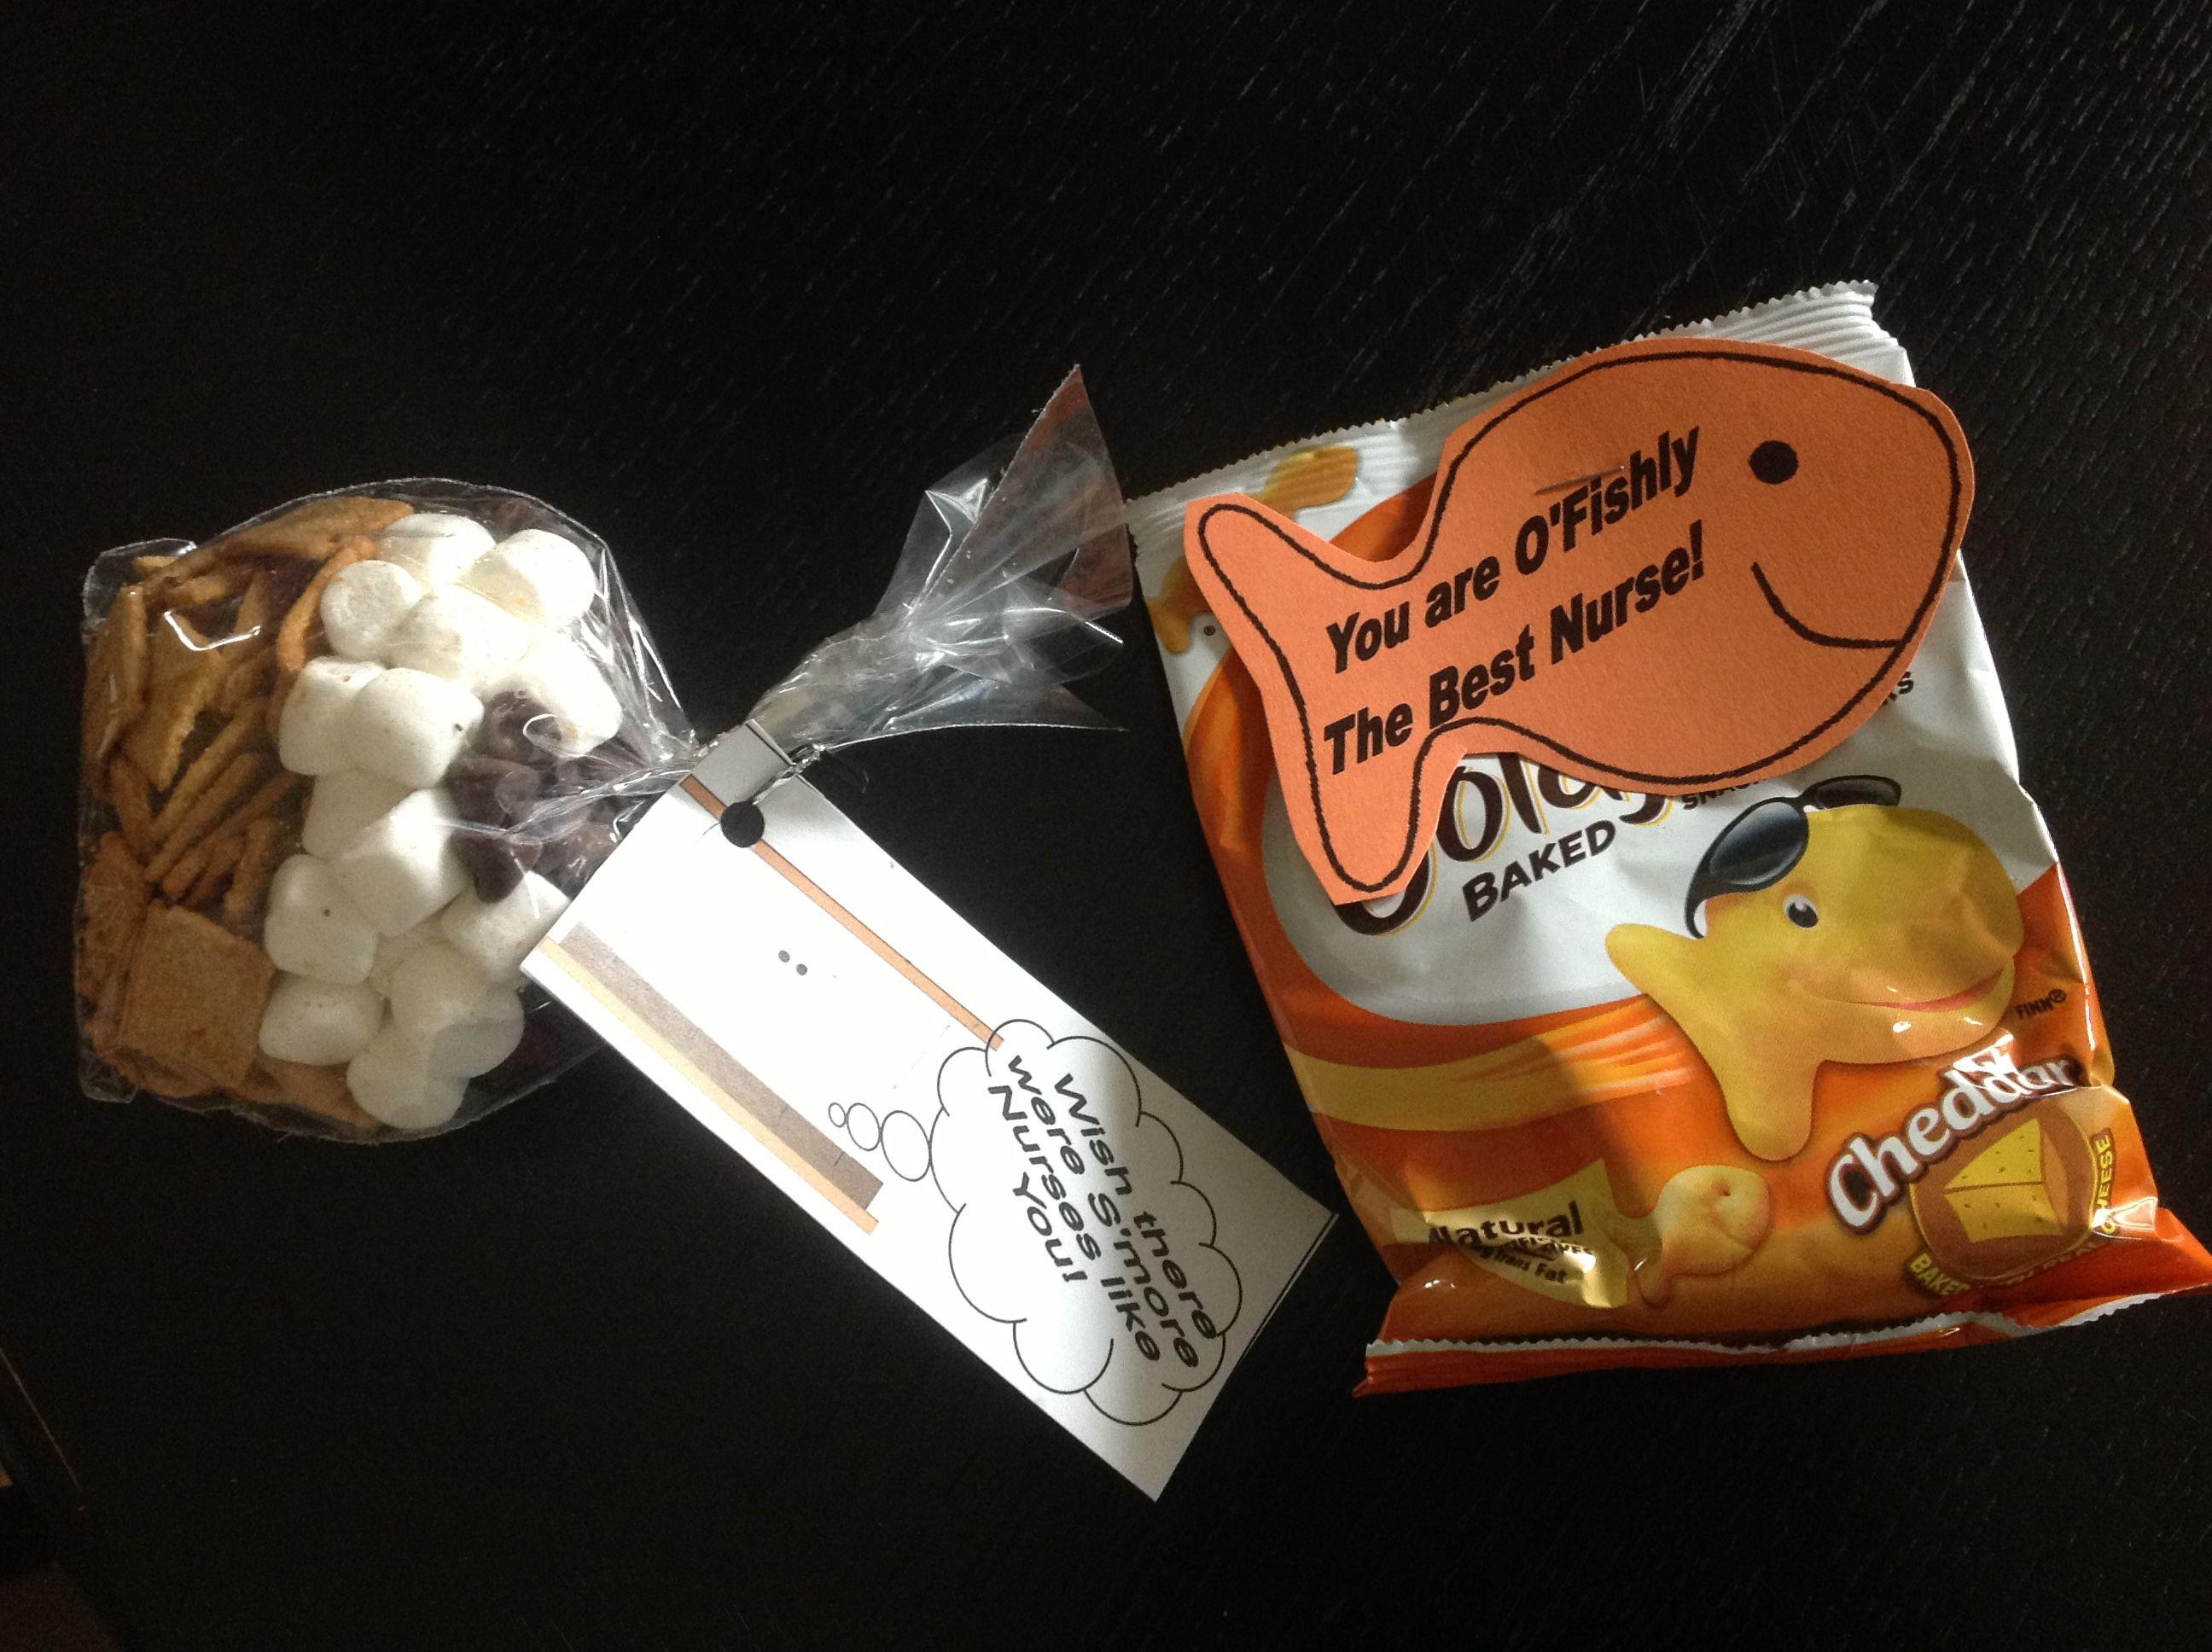 Nurses week snacks diy crafts pinterest nurses for Gift ideas for assistants